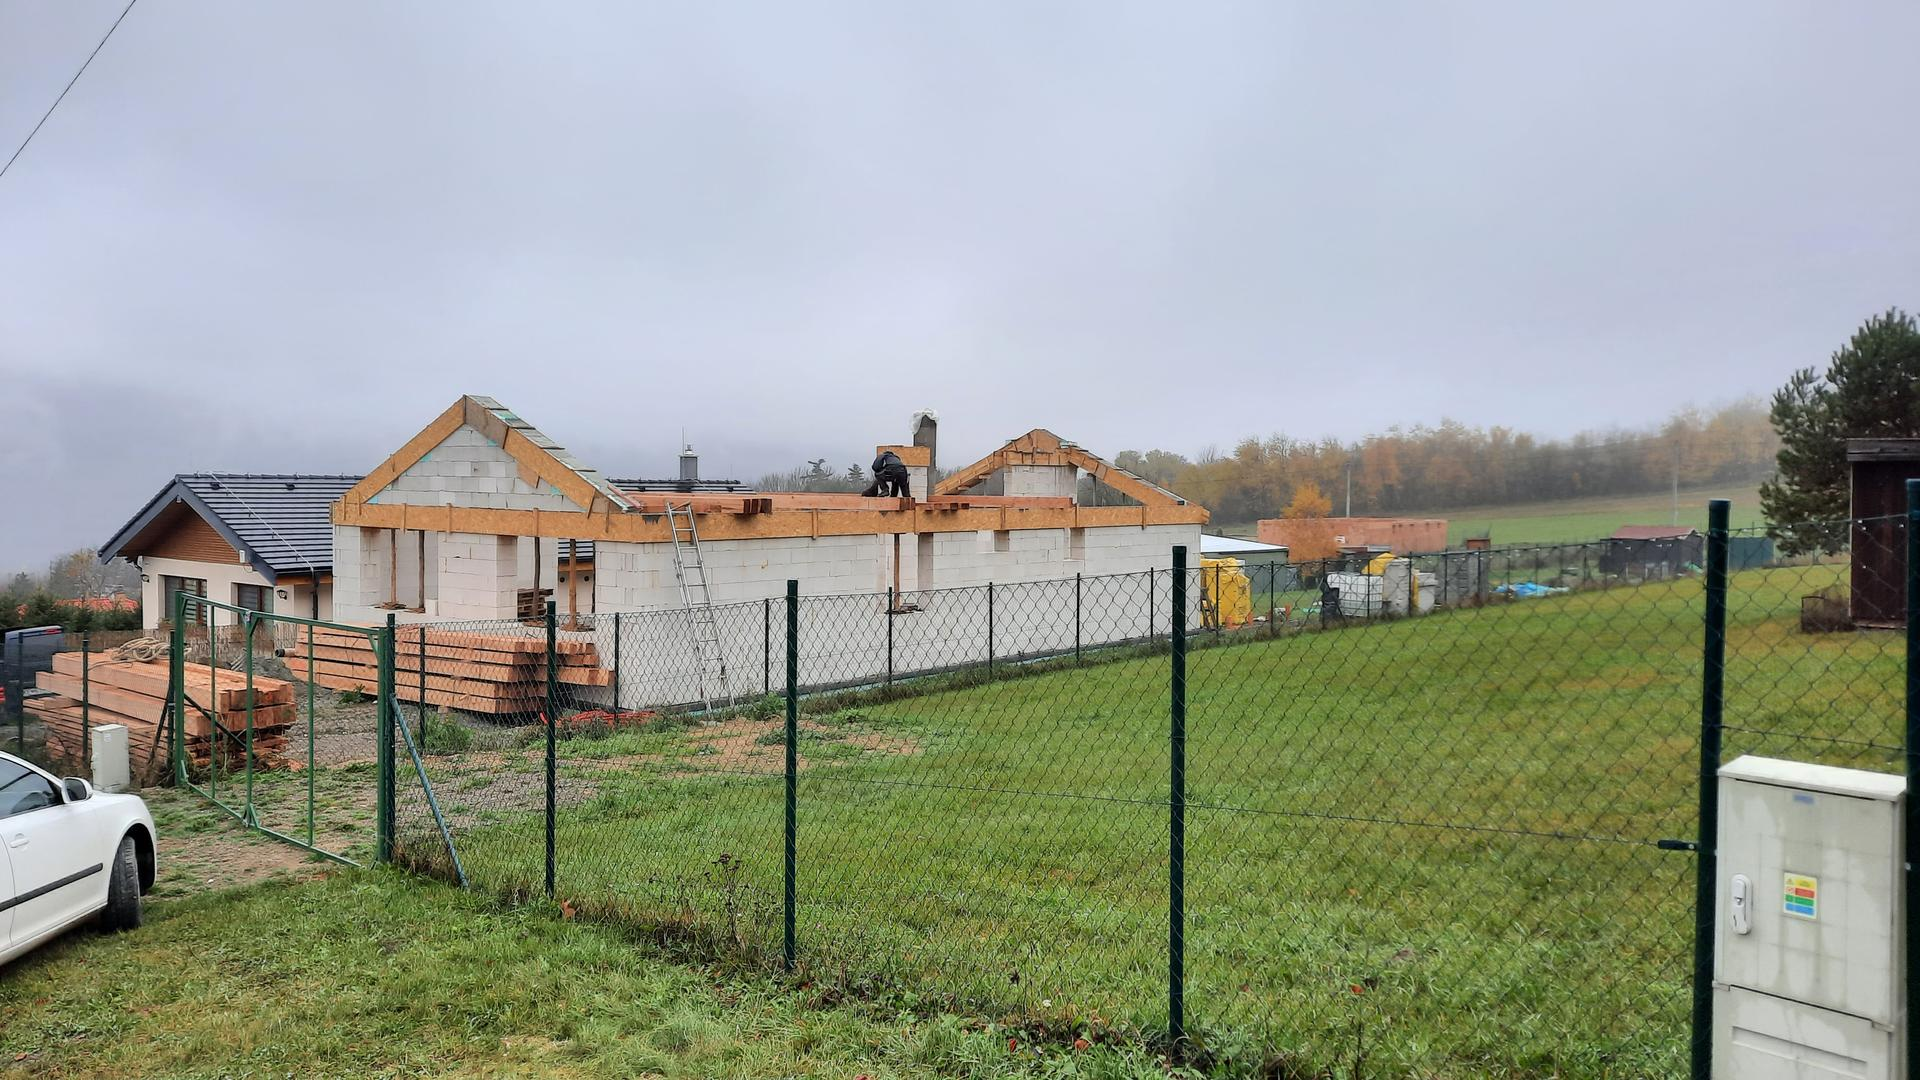 Bungalov 1871 - Zaliaty aj stit, beton vytvrdnuty a nastupuju strechari 13.11.2020